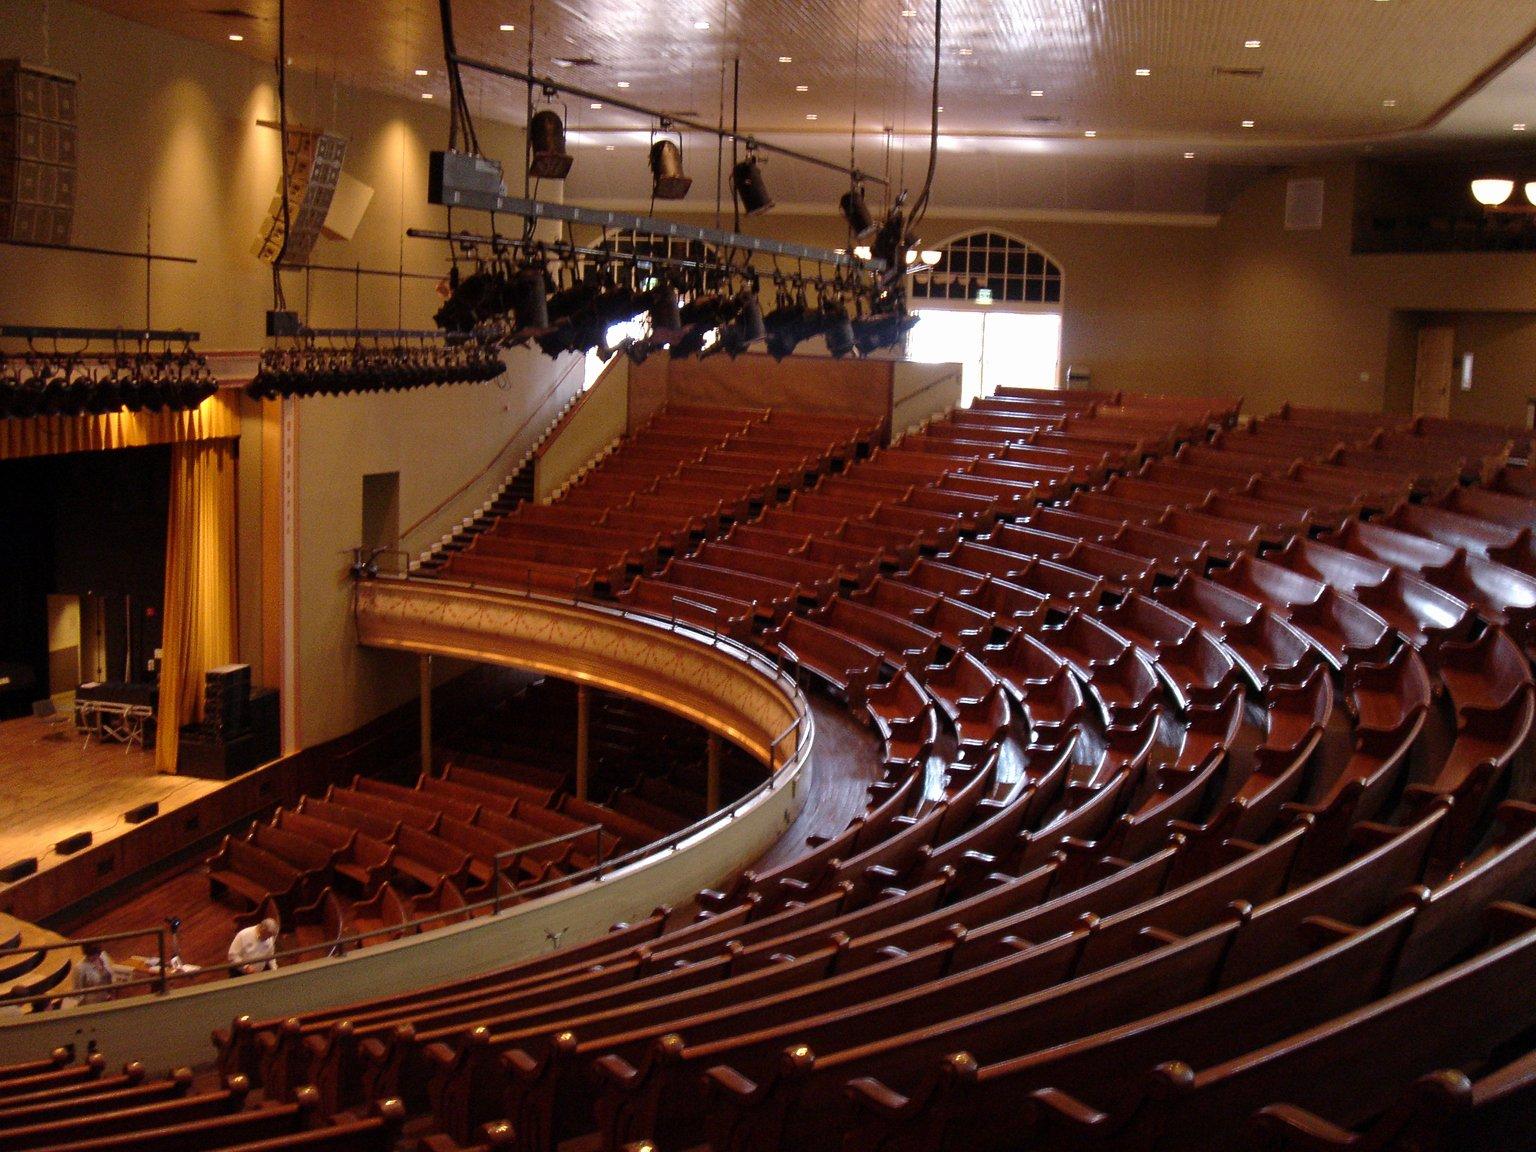 Seating Chart for Ryman Auditorium Luxury Sacred Ground Travel Magazine Smooth Getaway Postcard